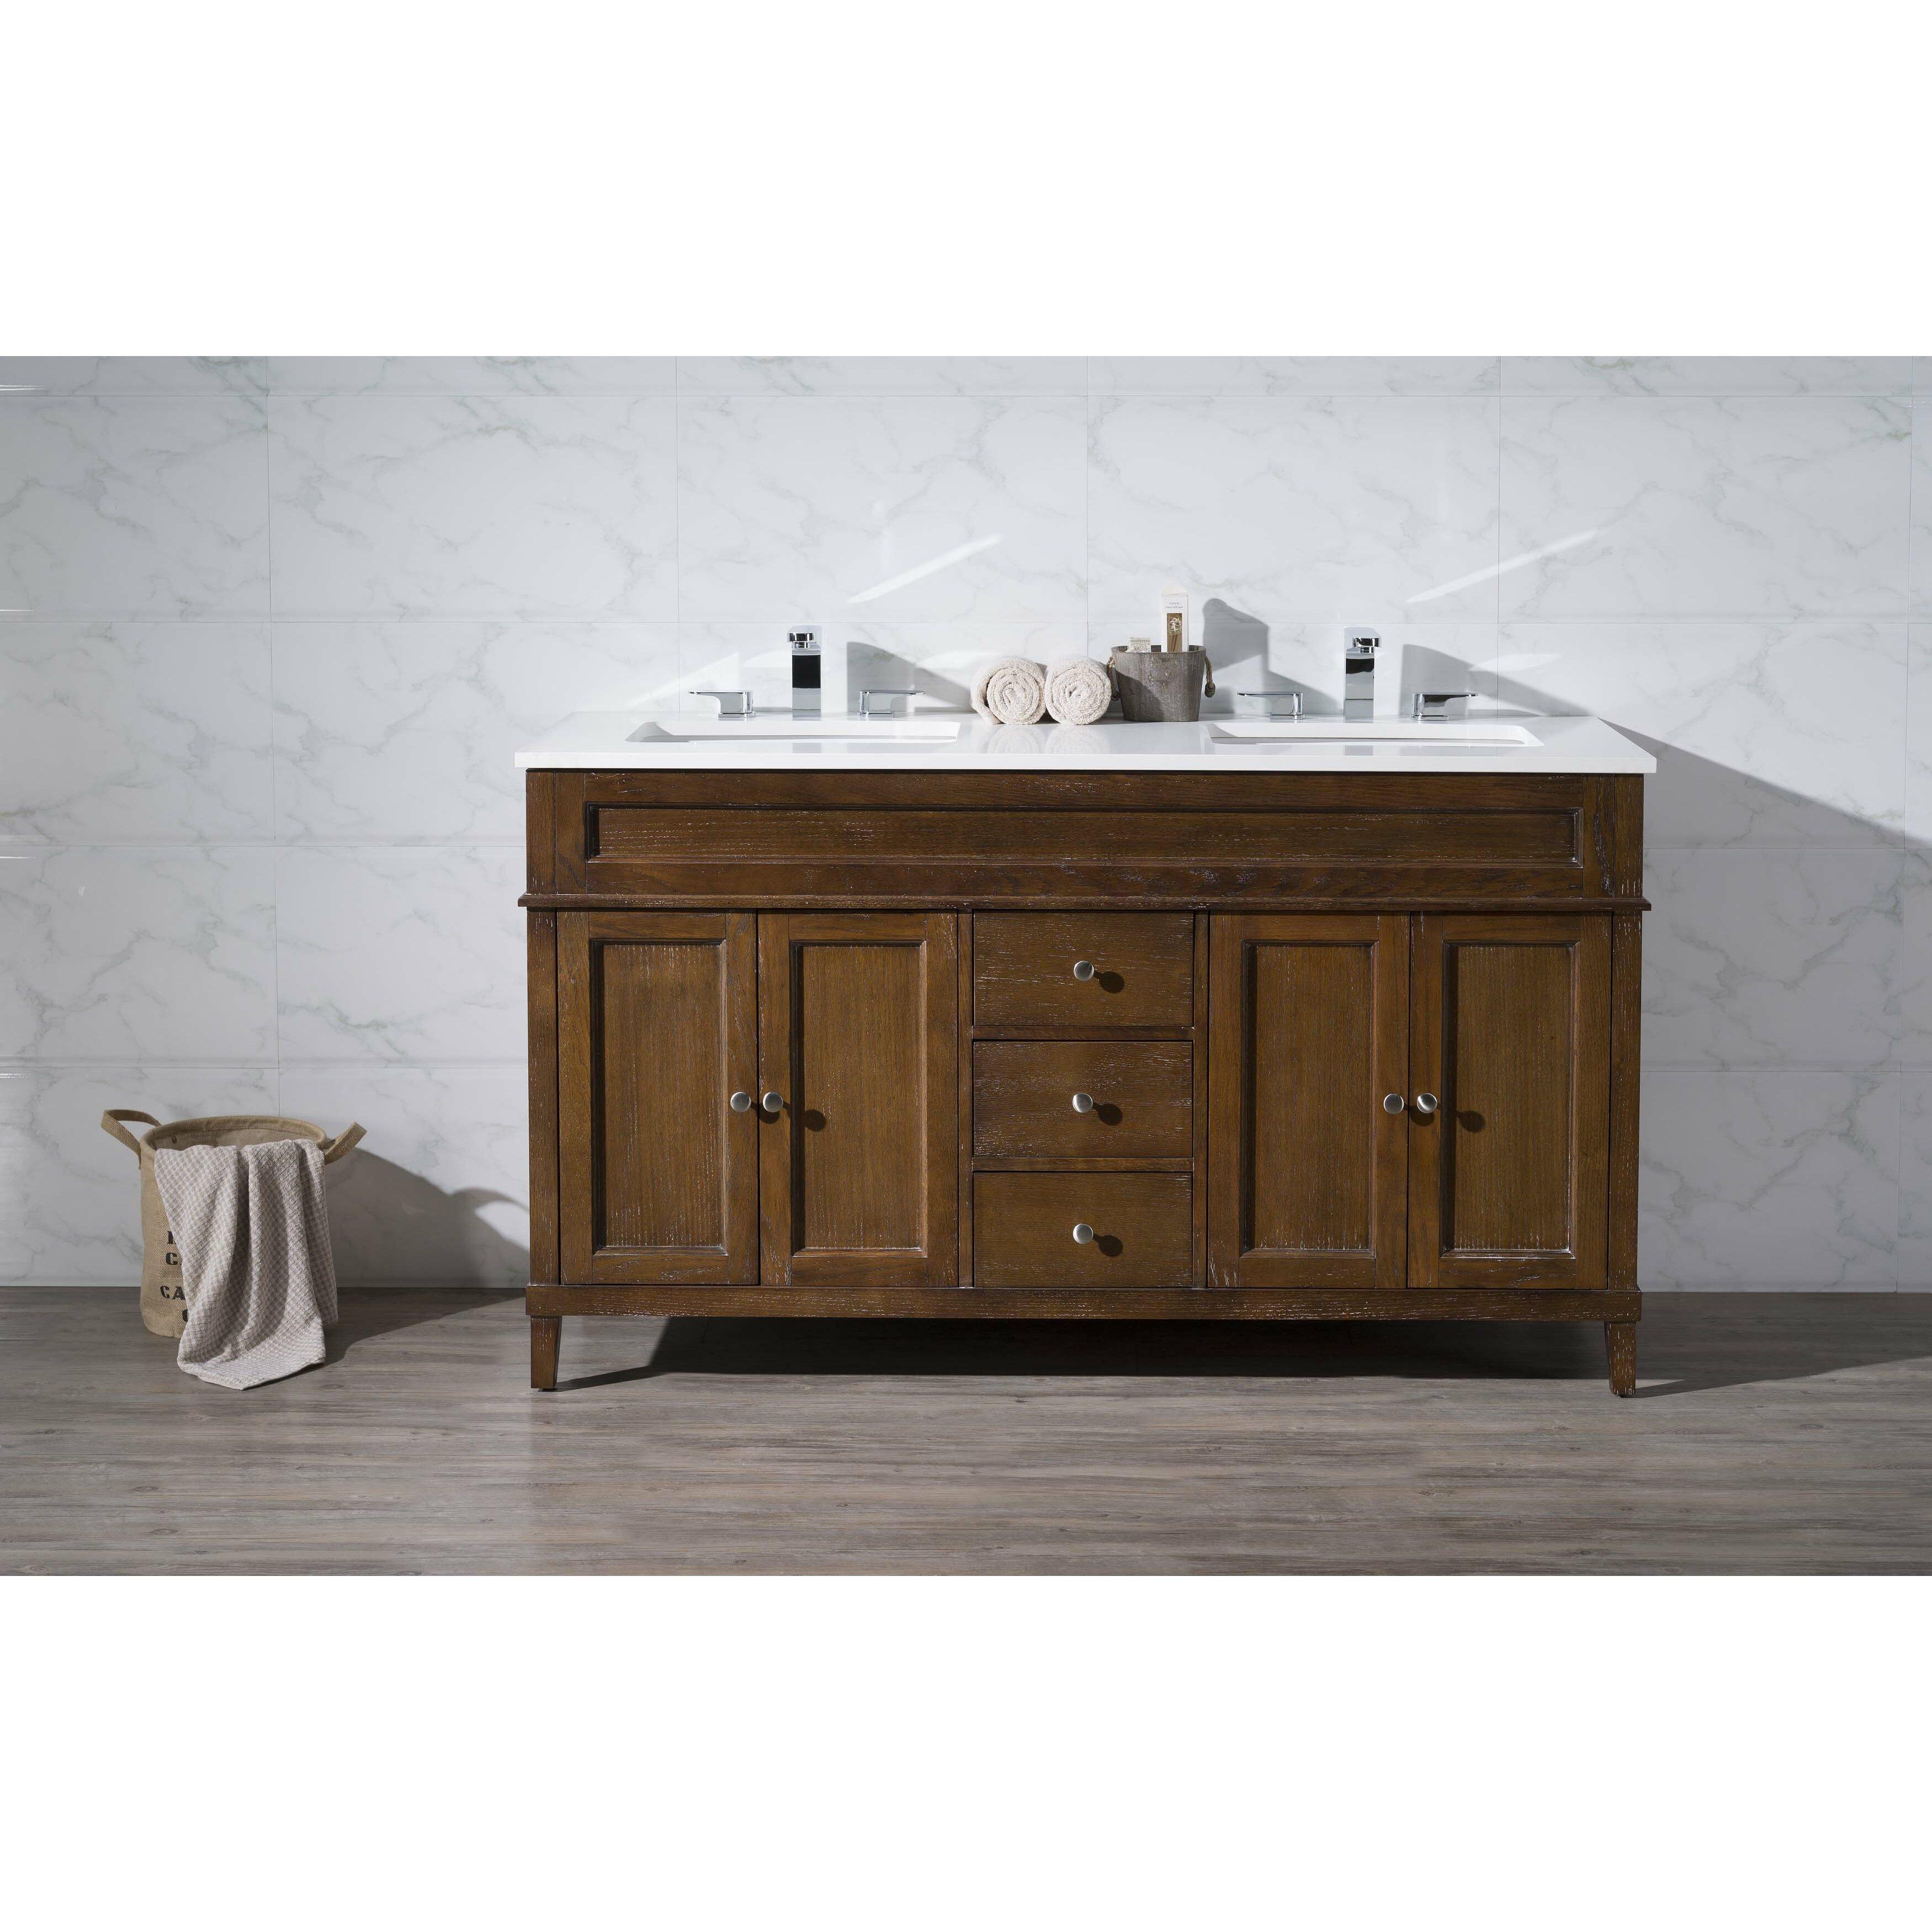 DCOR Design Oakmont 59 Double Sink Bathroom Vanity Set Reviews